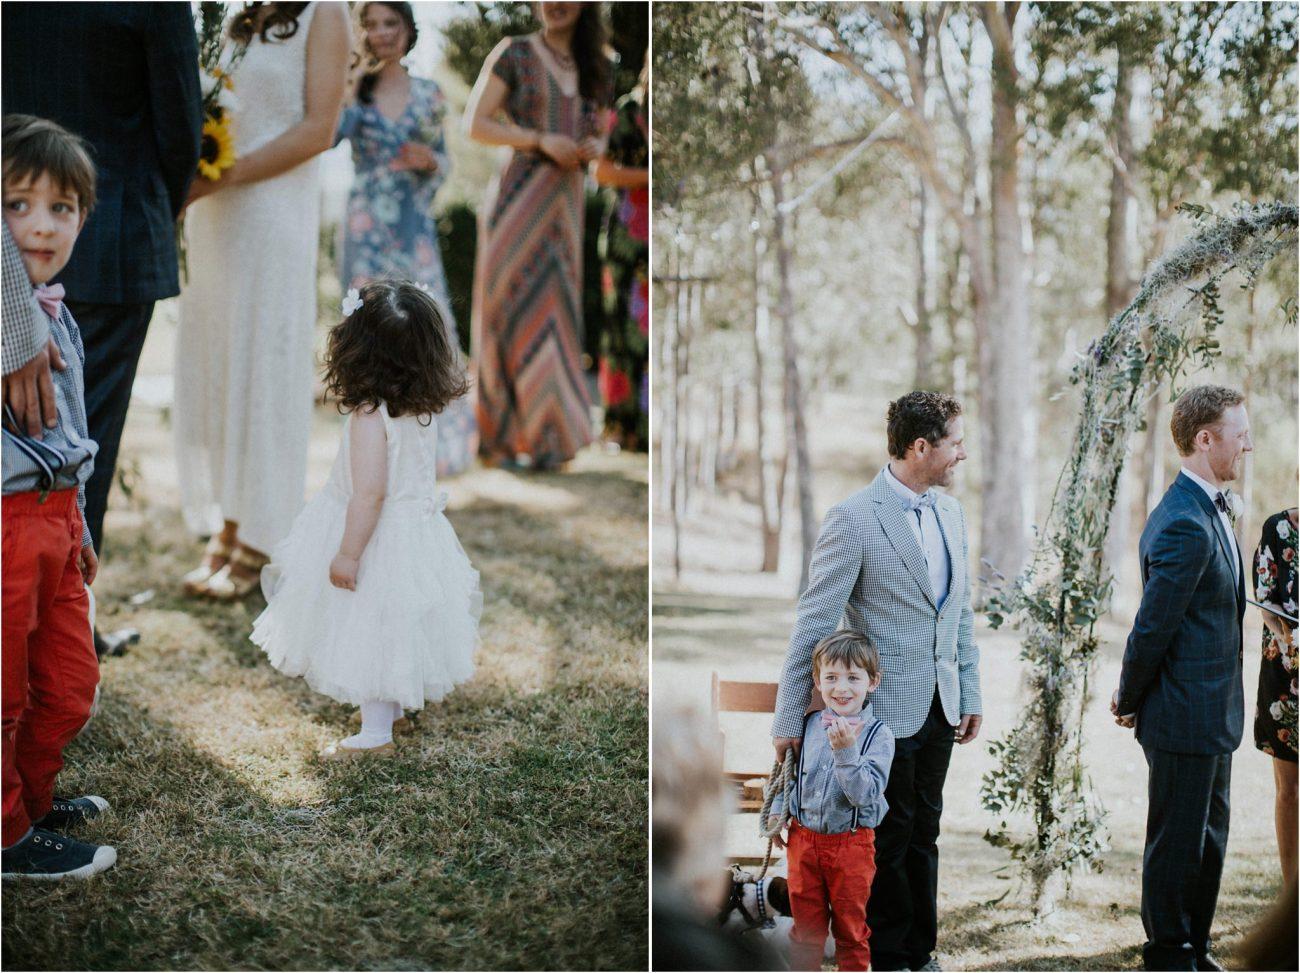 hunter-valley-wedding-photographer-joshua-mikhaiel759